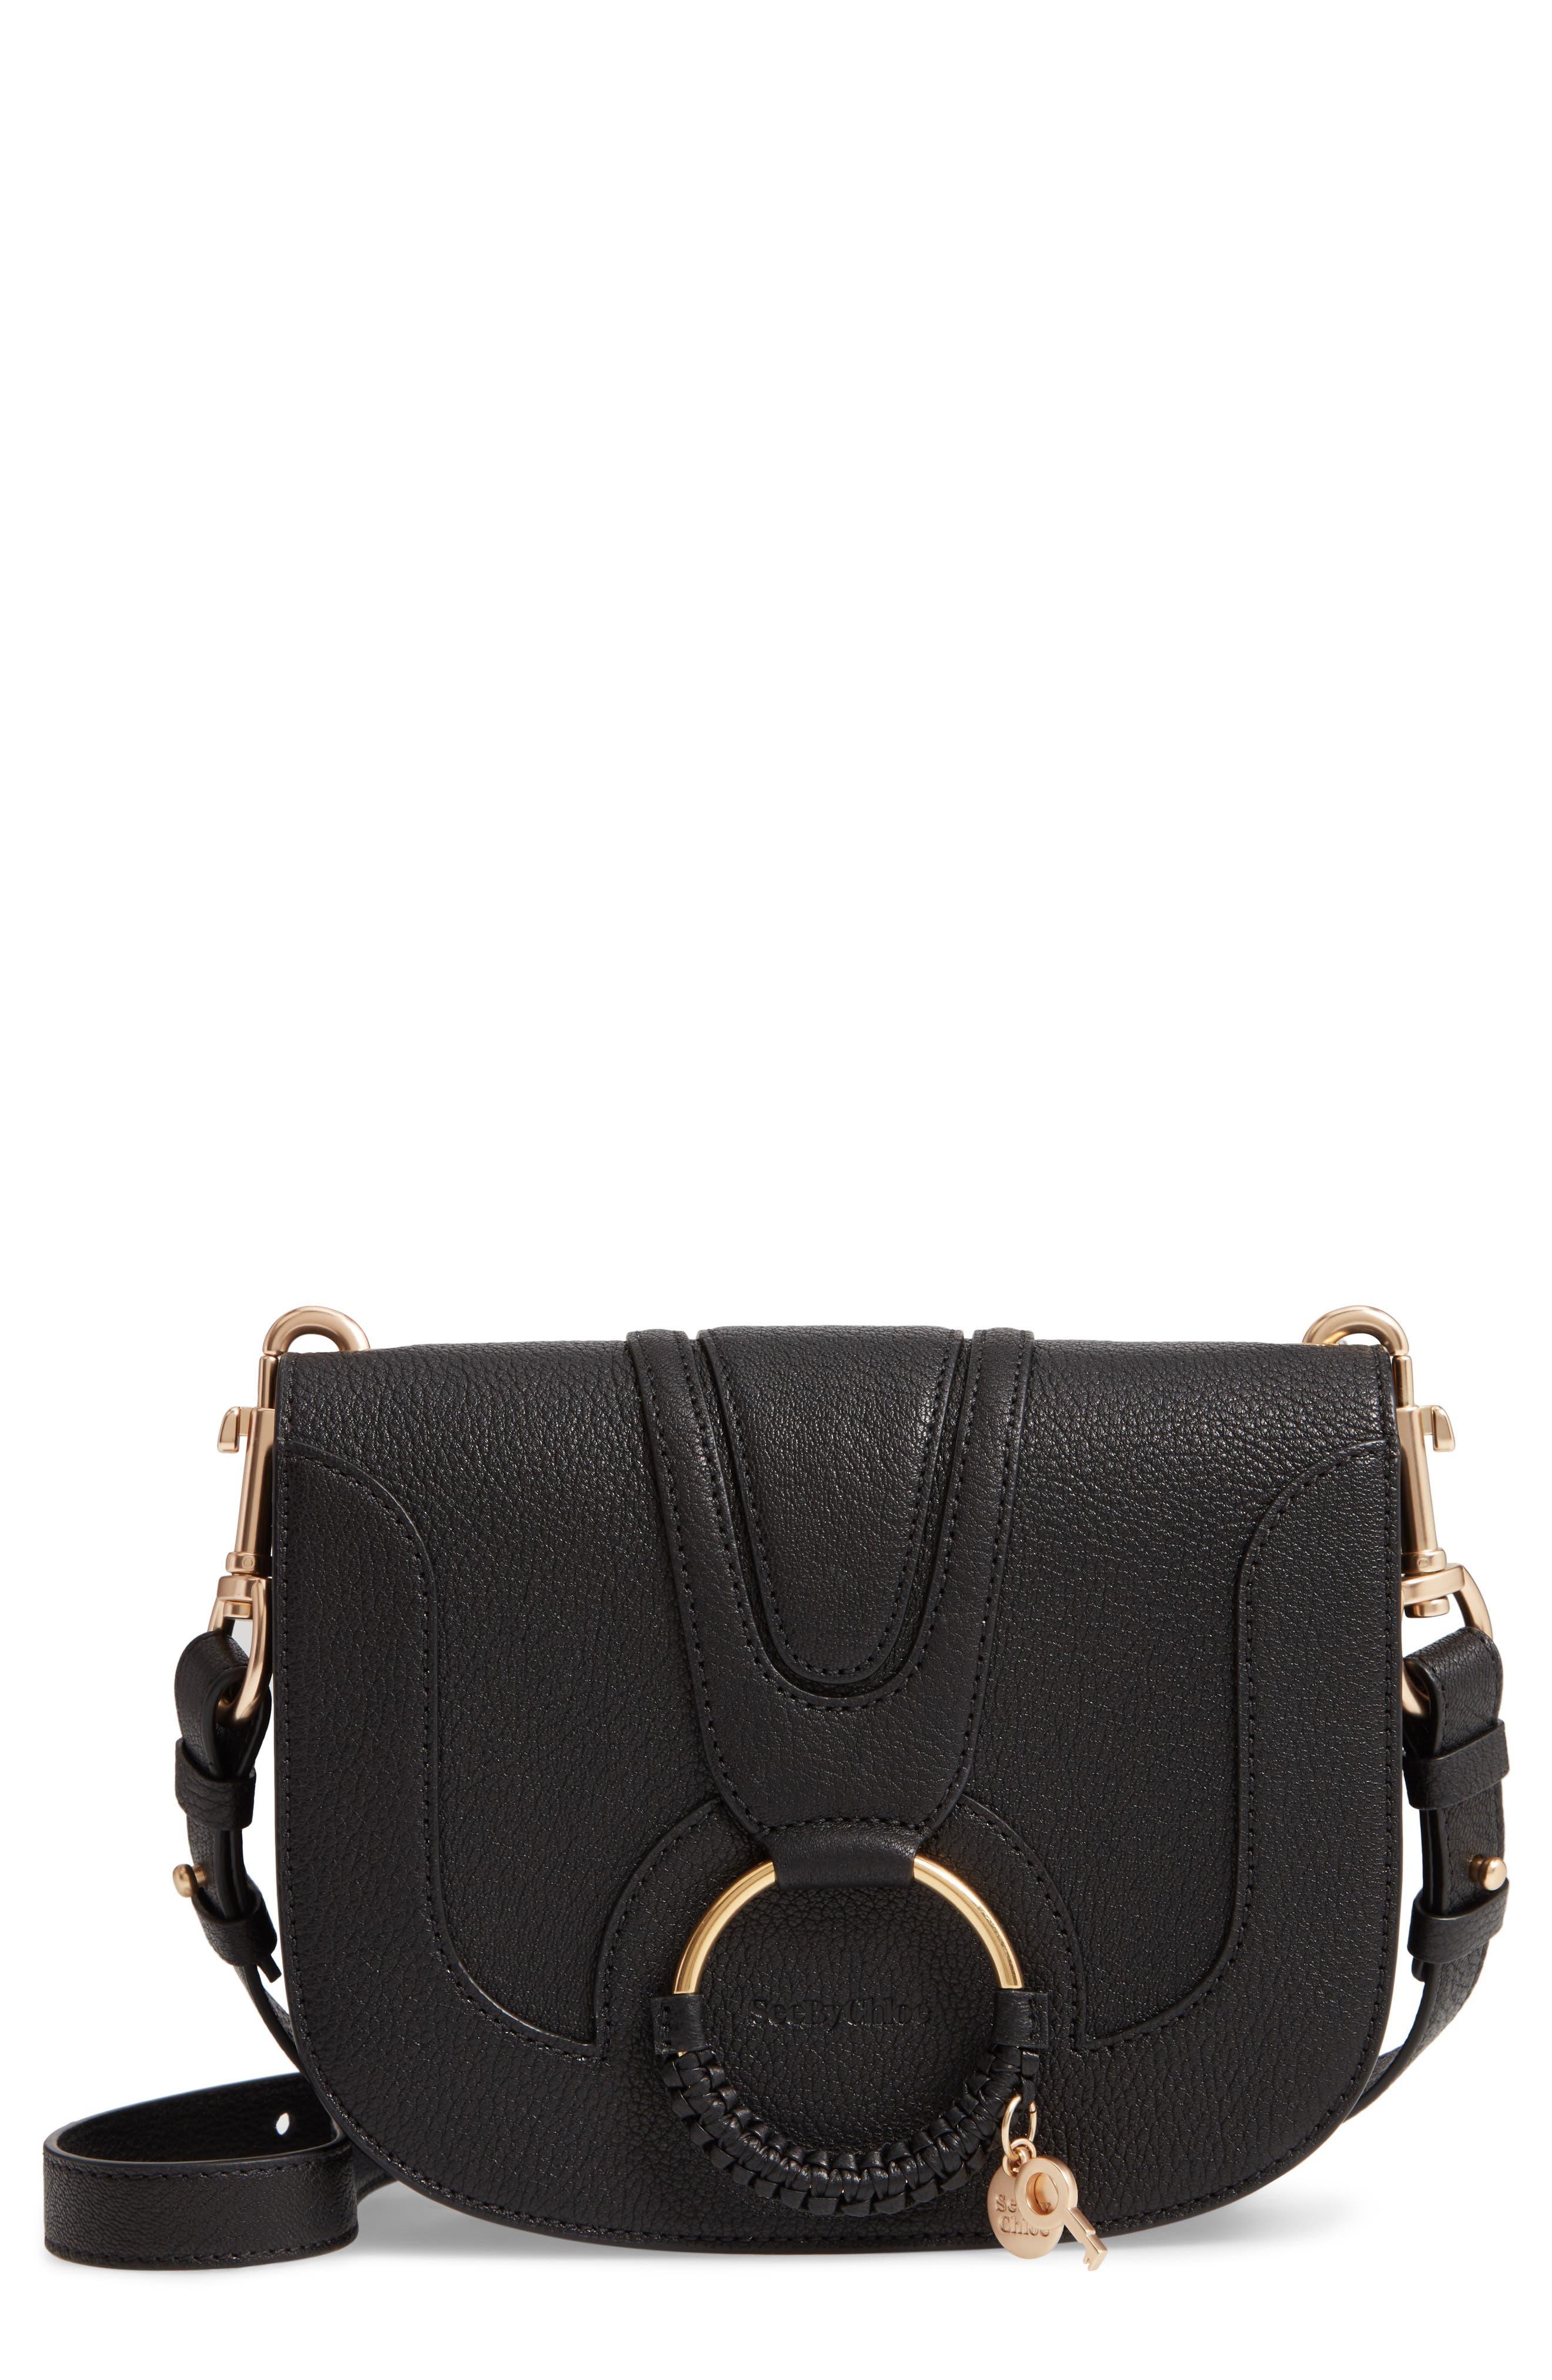 SEE BY CHLOÉ, Hana Small Leather Crossbody Bag, Main thumbnail 1, color, 001